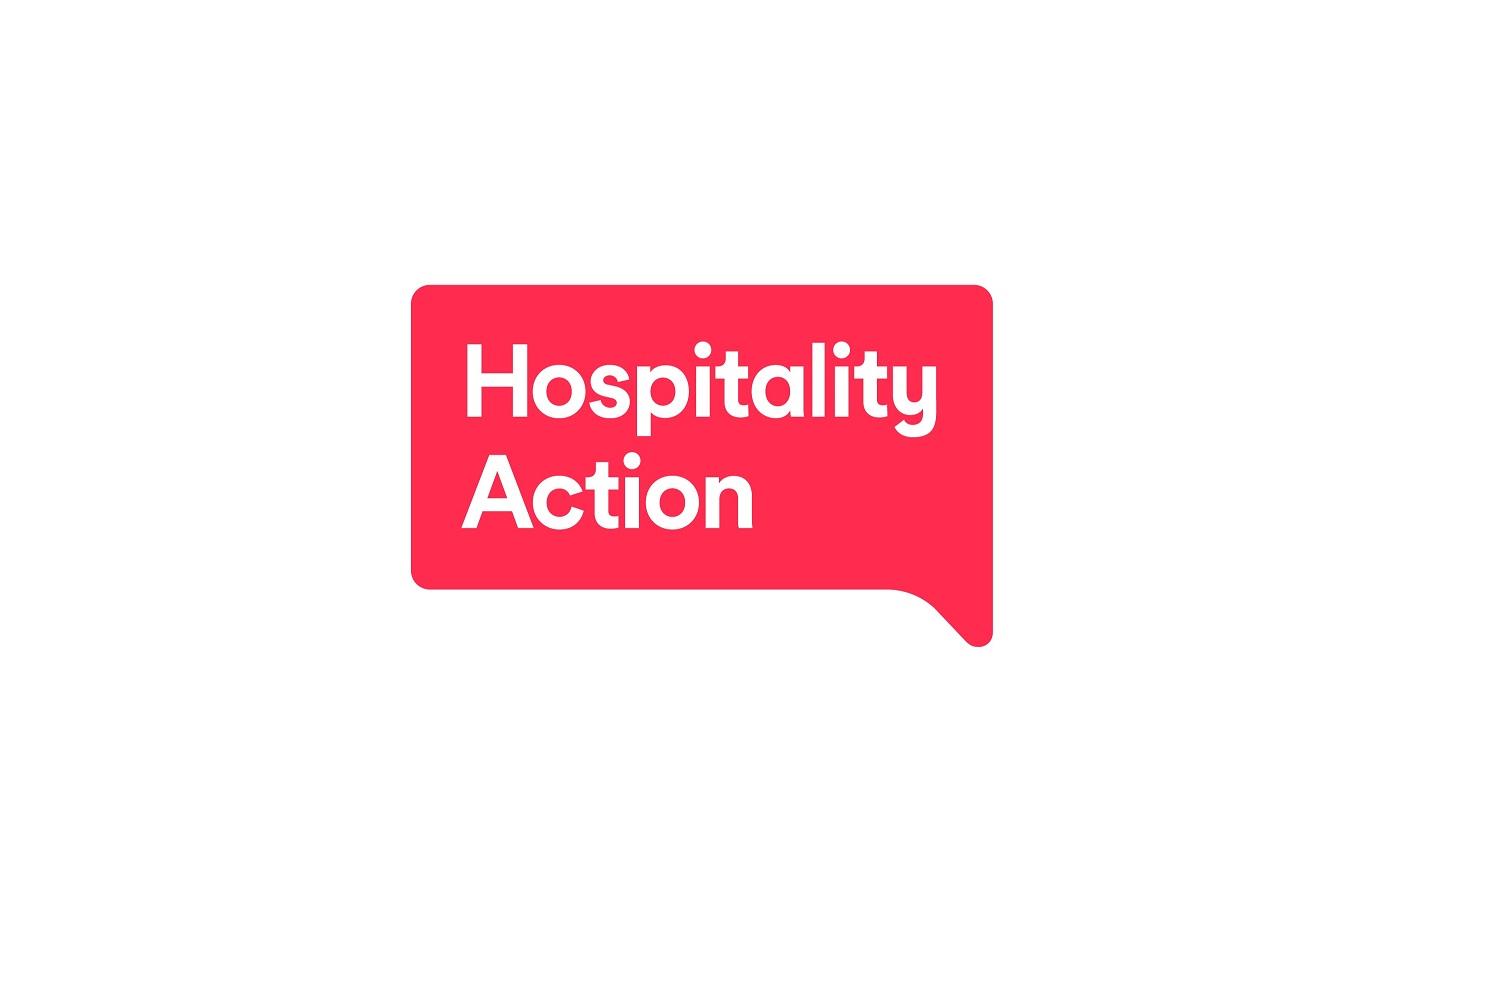 Hospitality Action logo